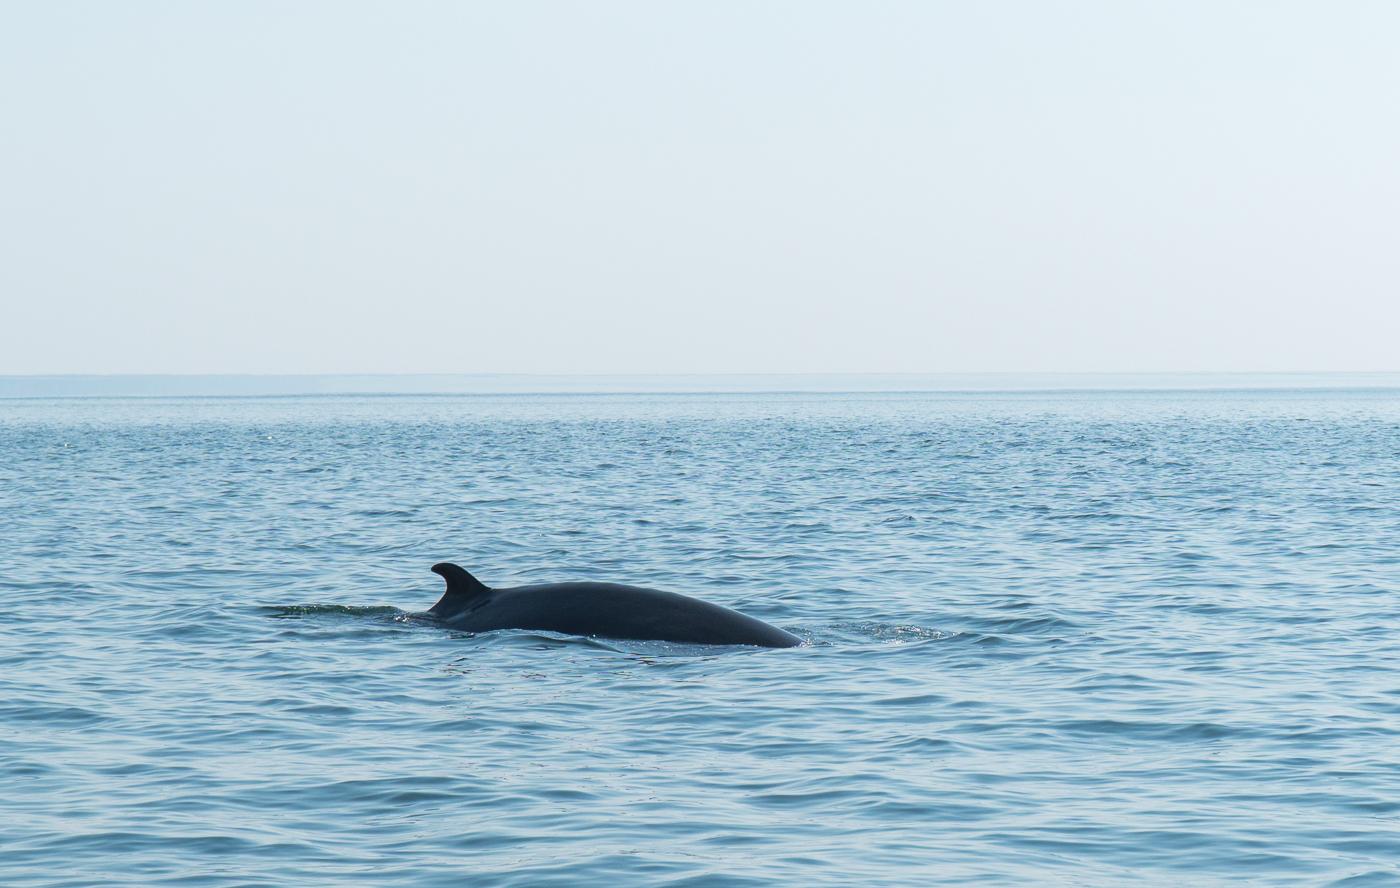 Baleines - Petit rorqual à St-Andrews, Nouveau-Brunswicka